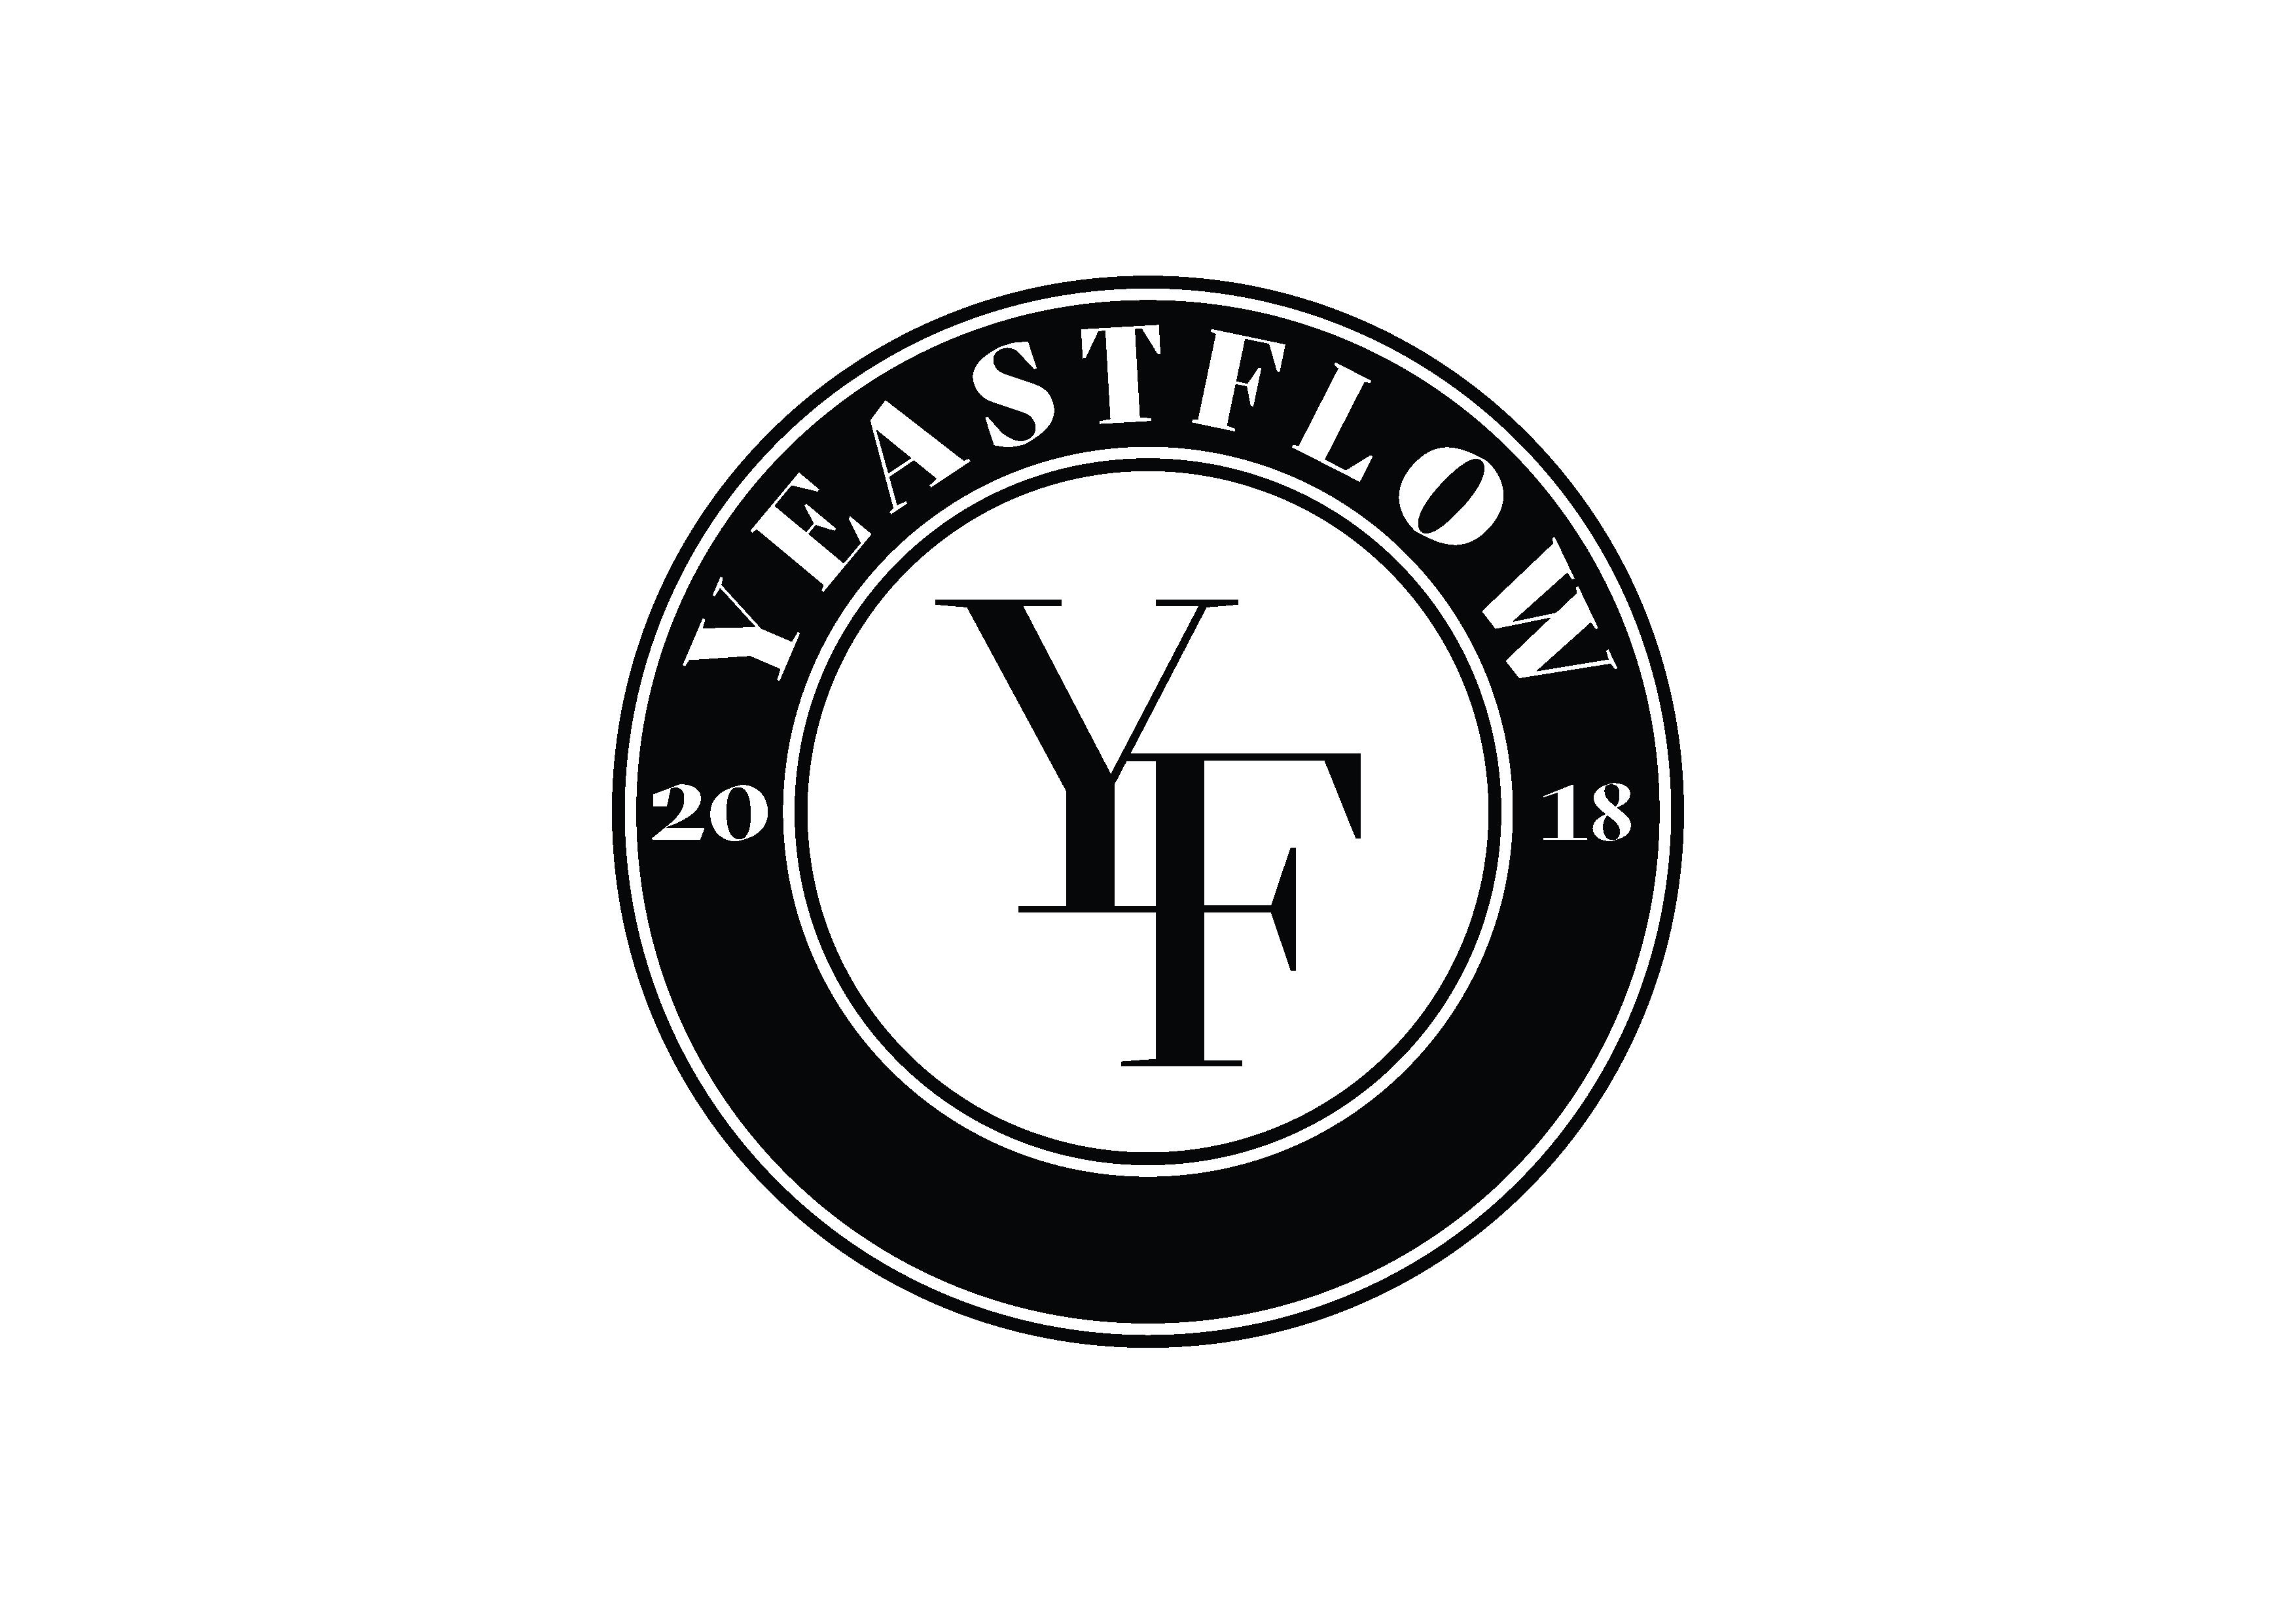 Yeastflow